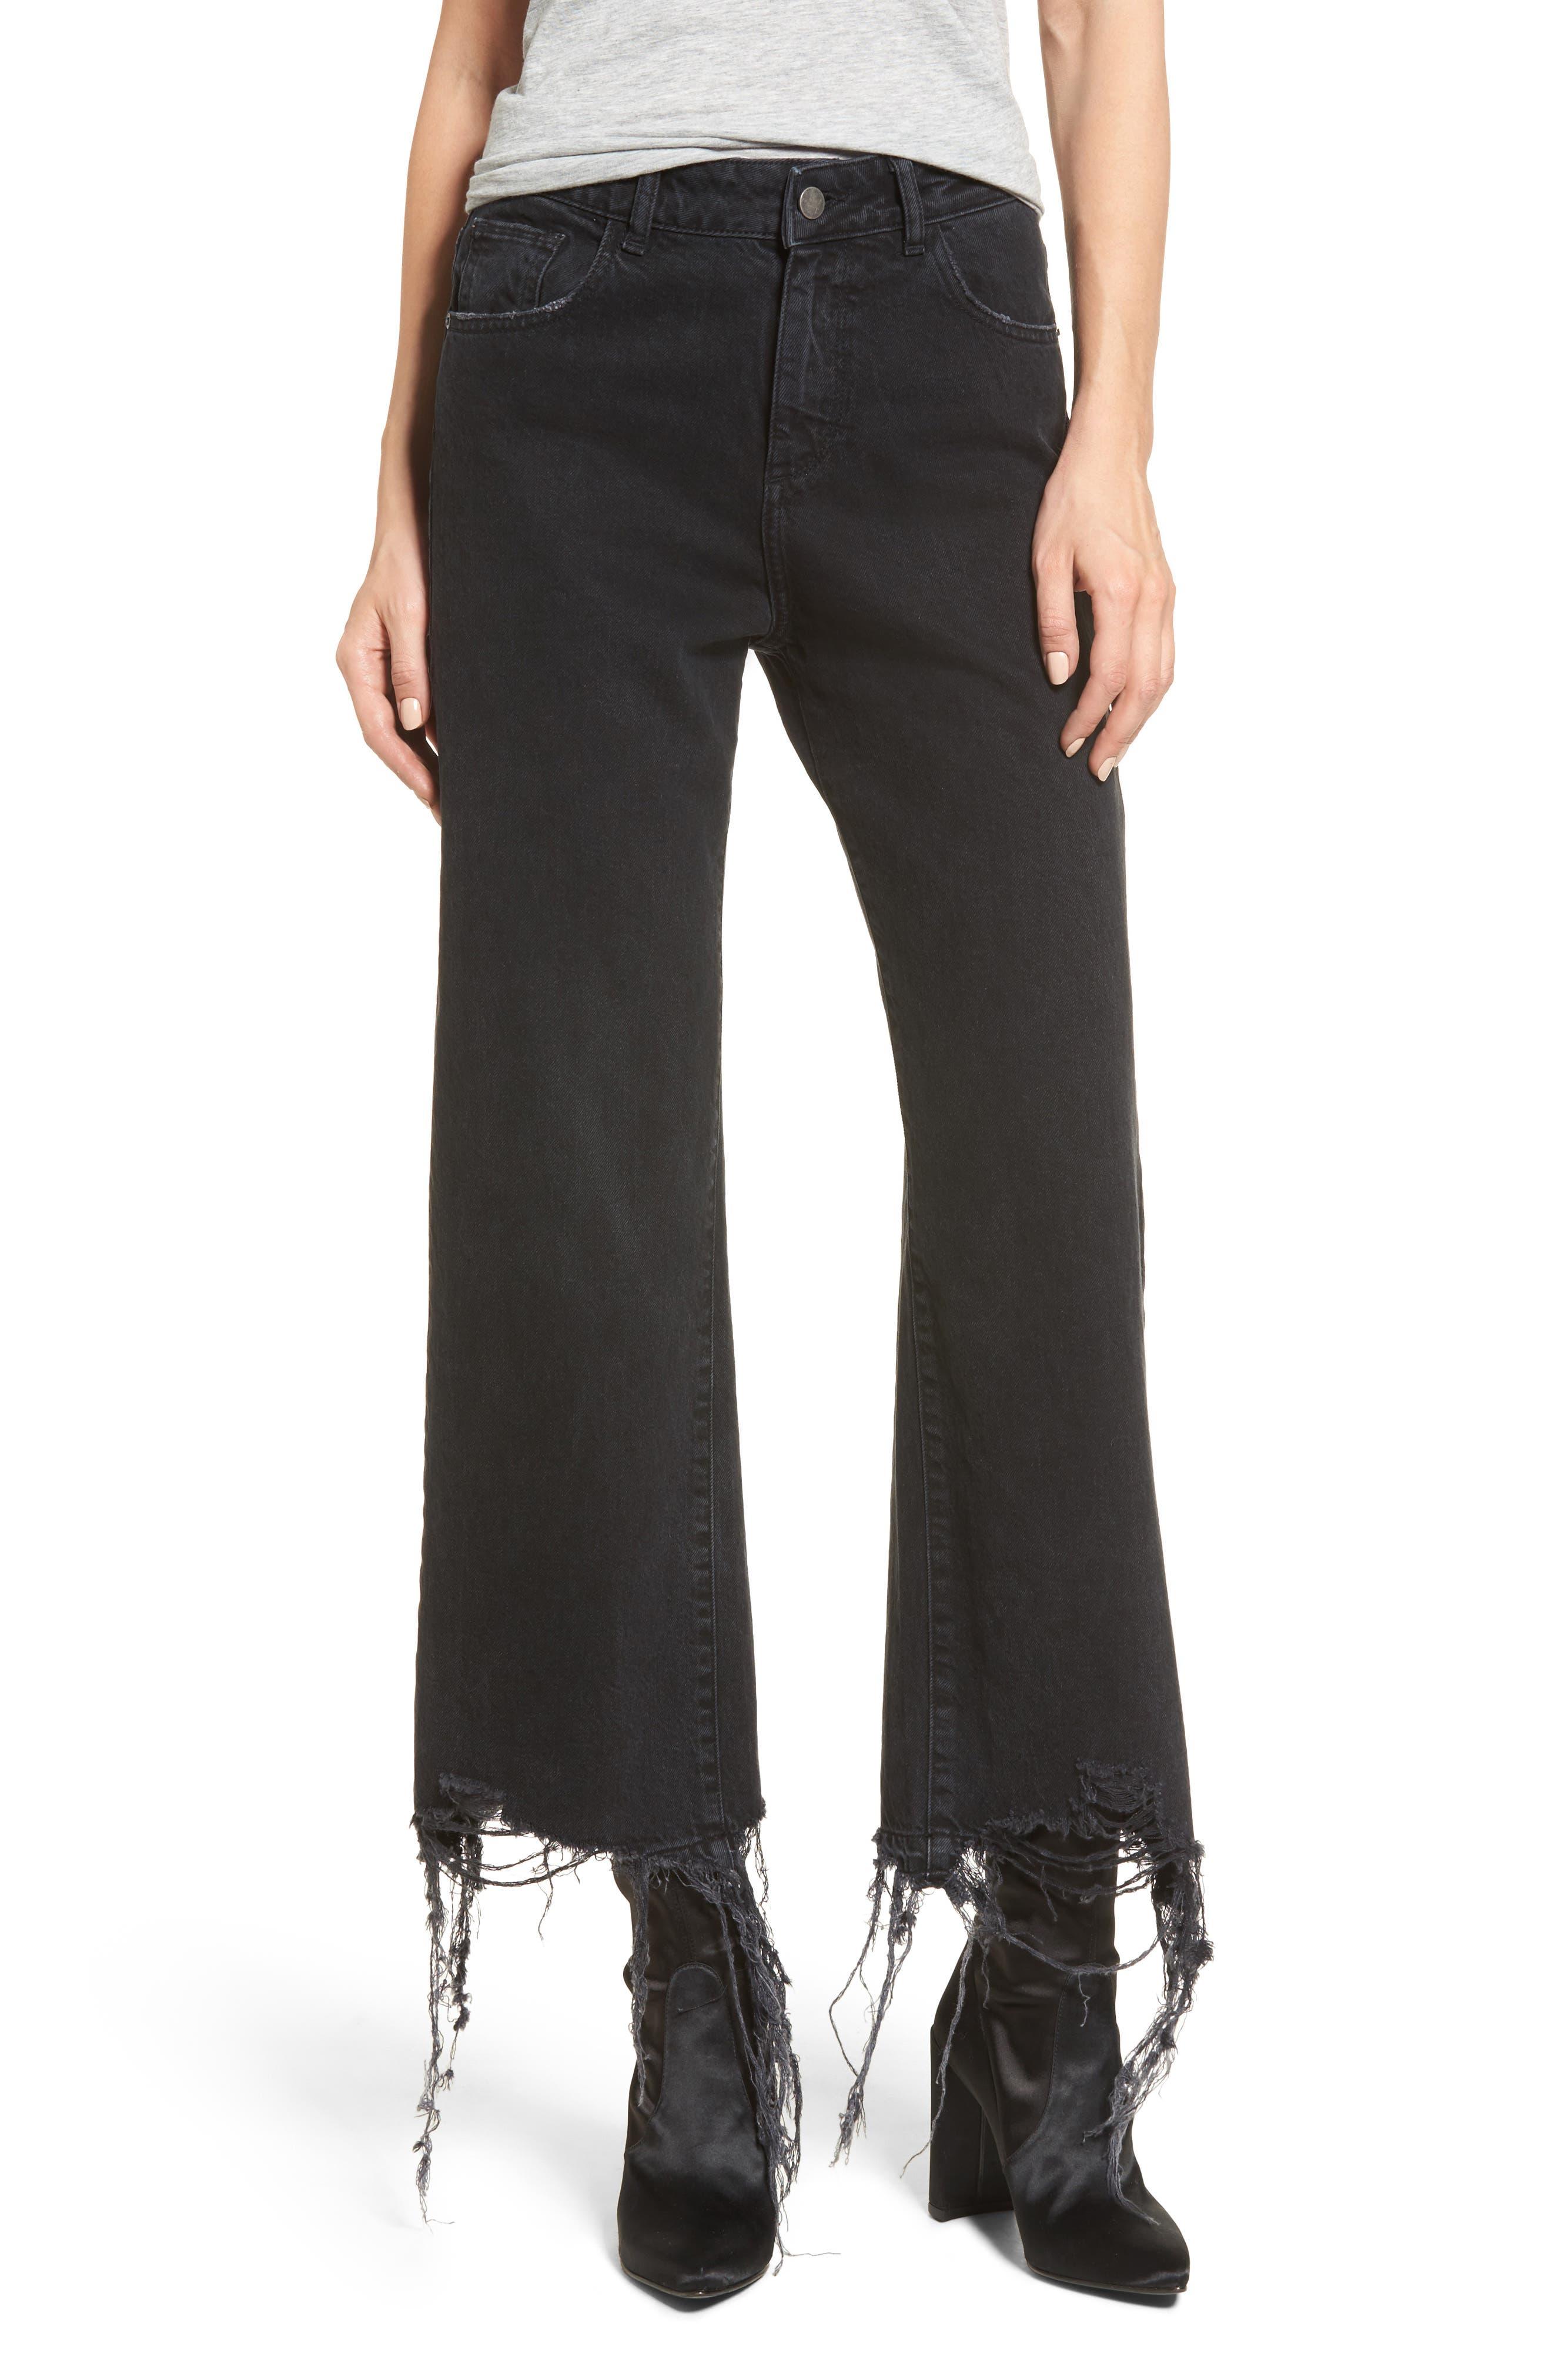 DL1961 Hepburn High Waist Wide Leg Jeans (Savannah Destroy)